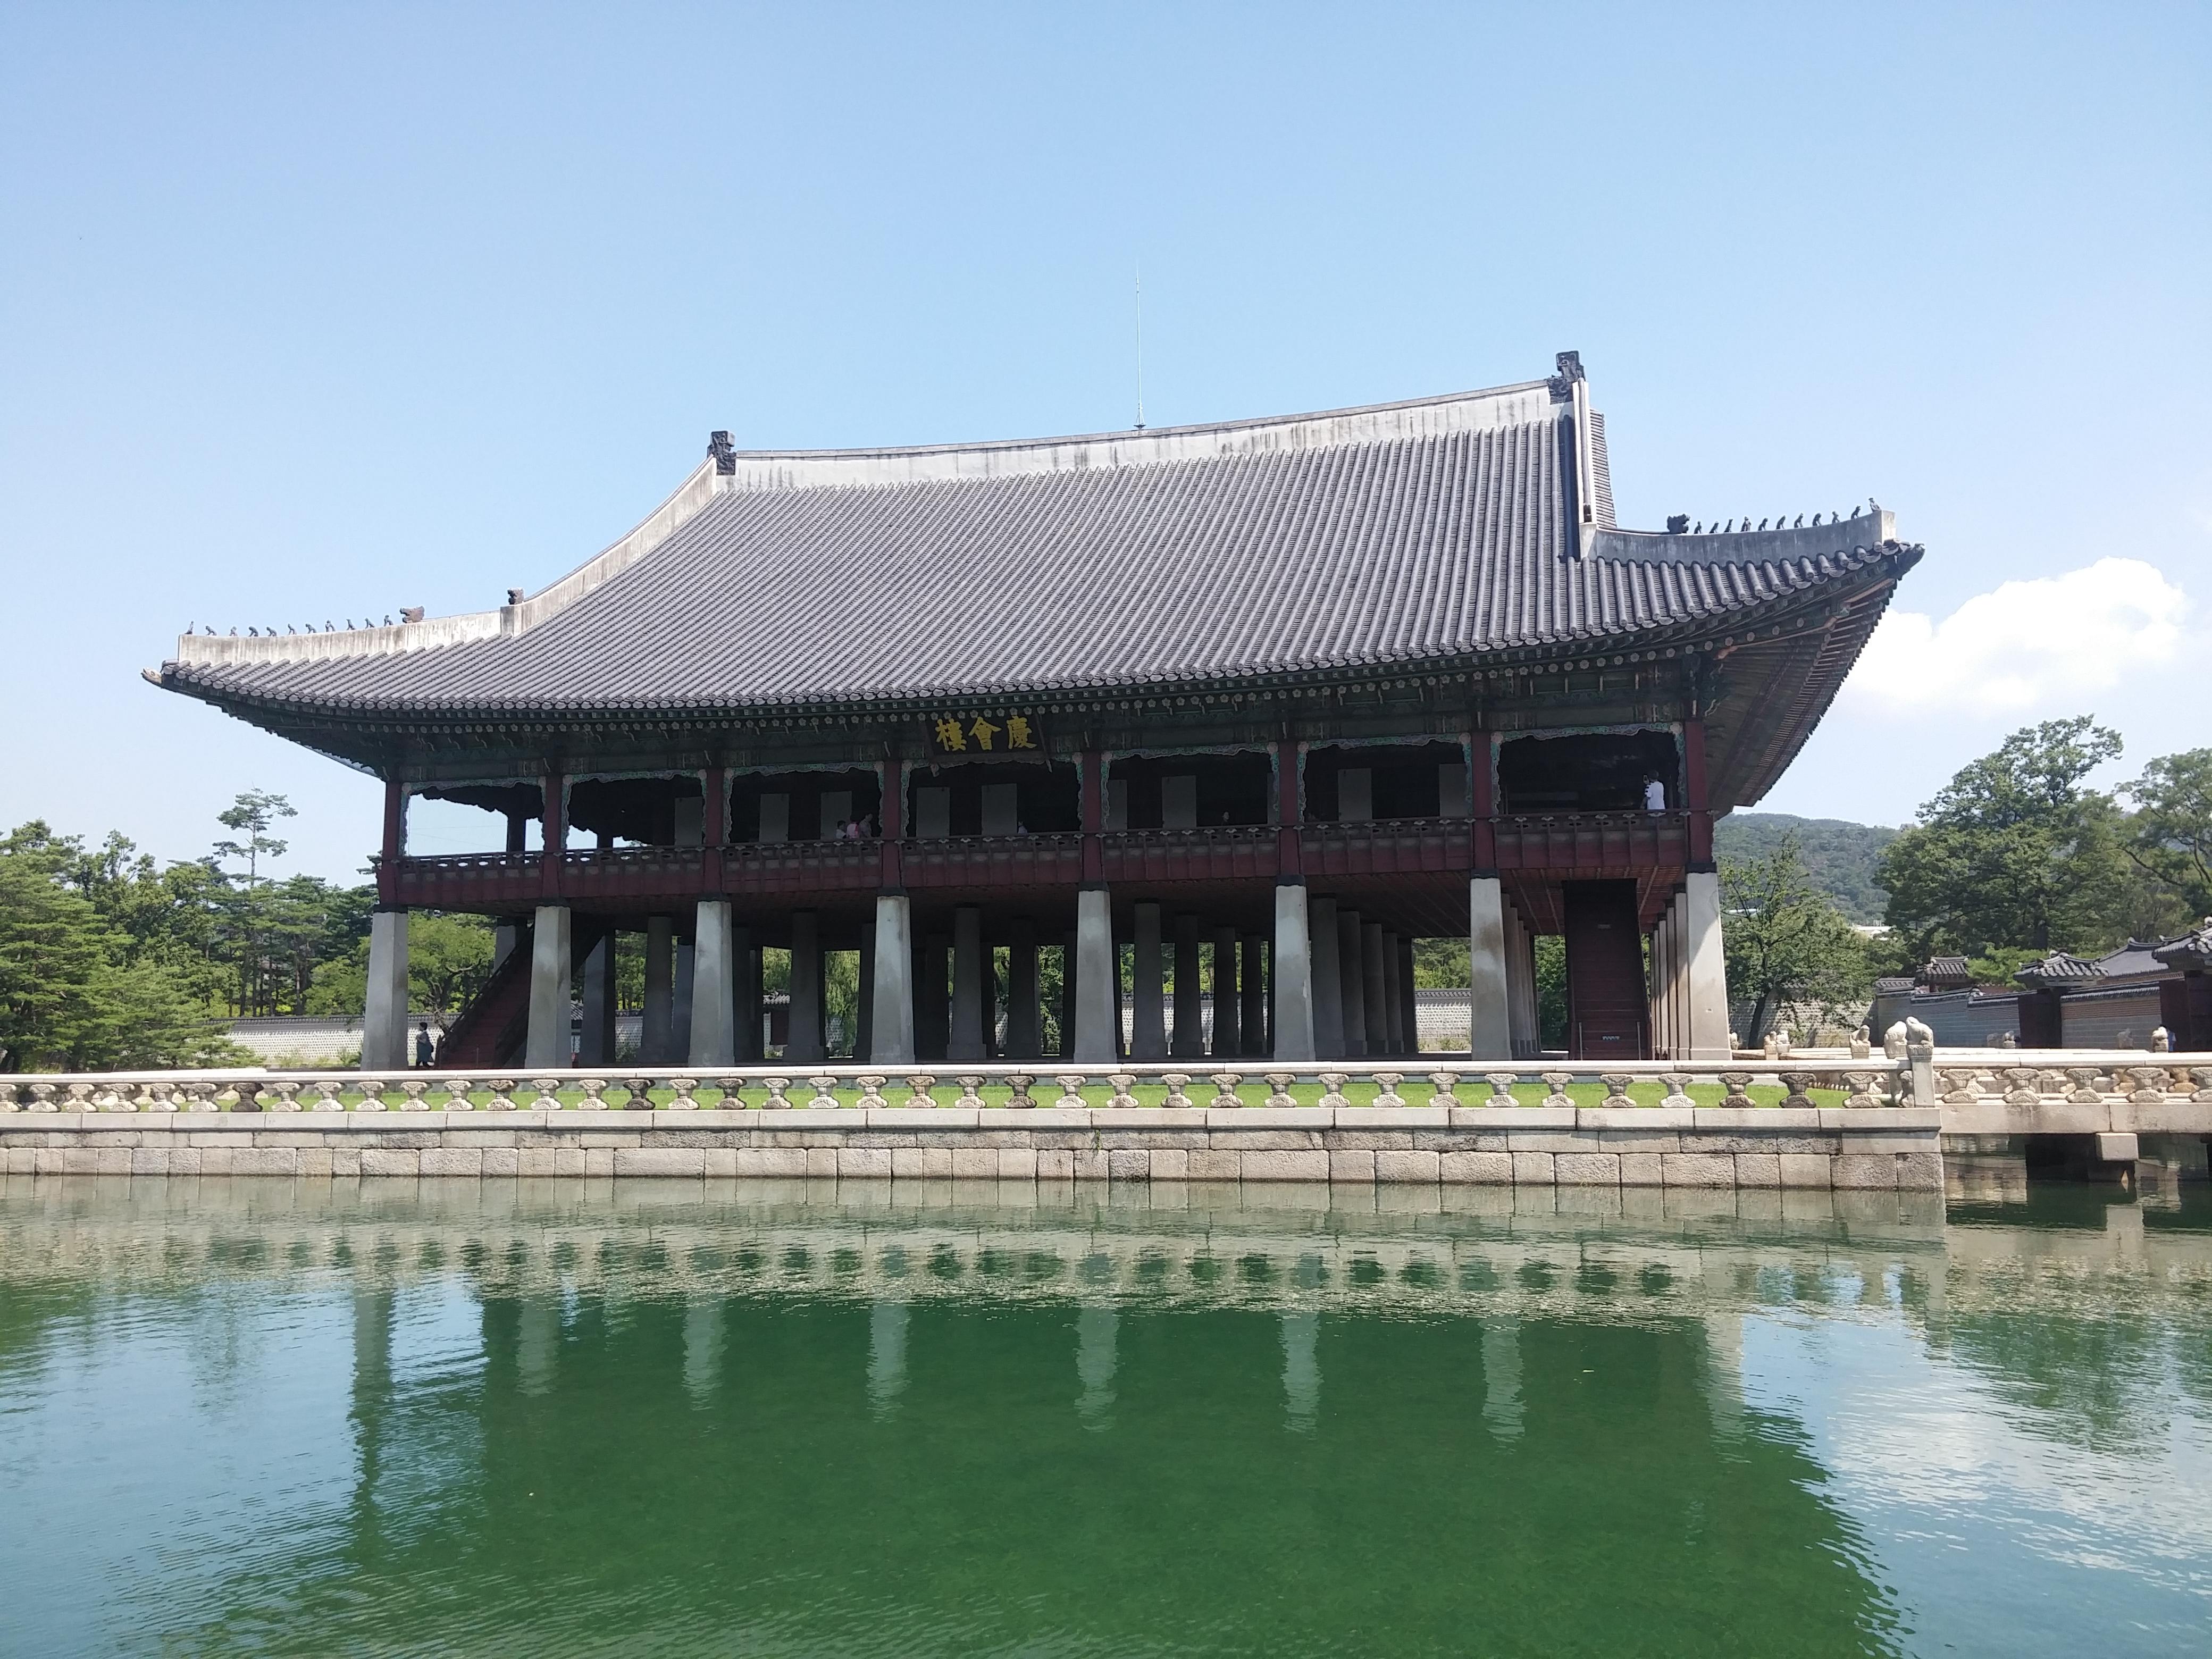 Pavilion in Gyeongbok Palace